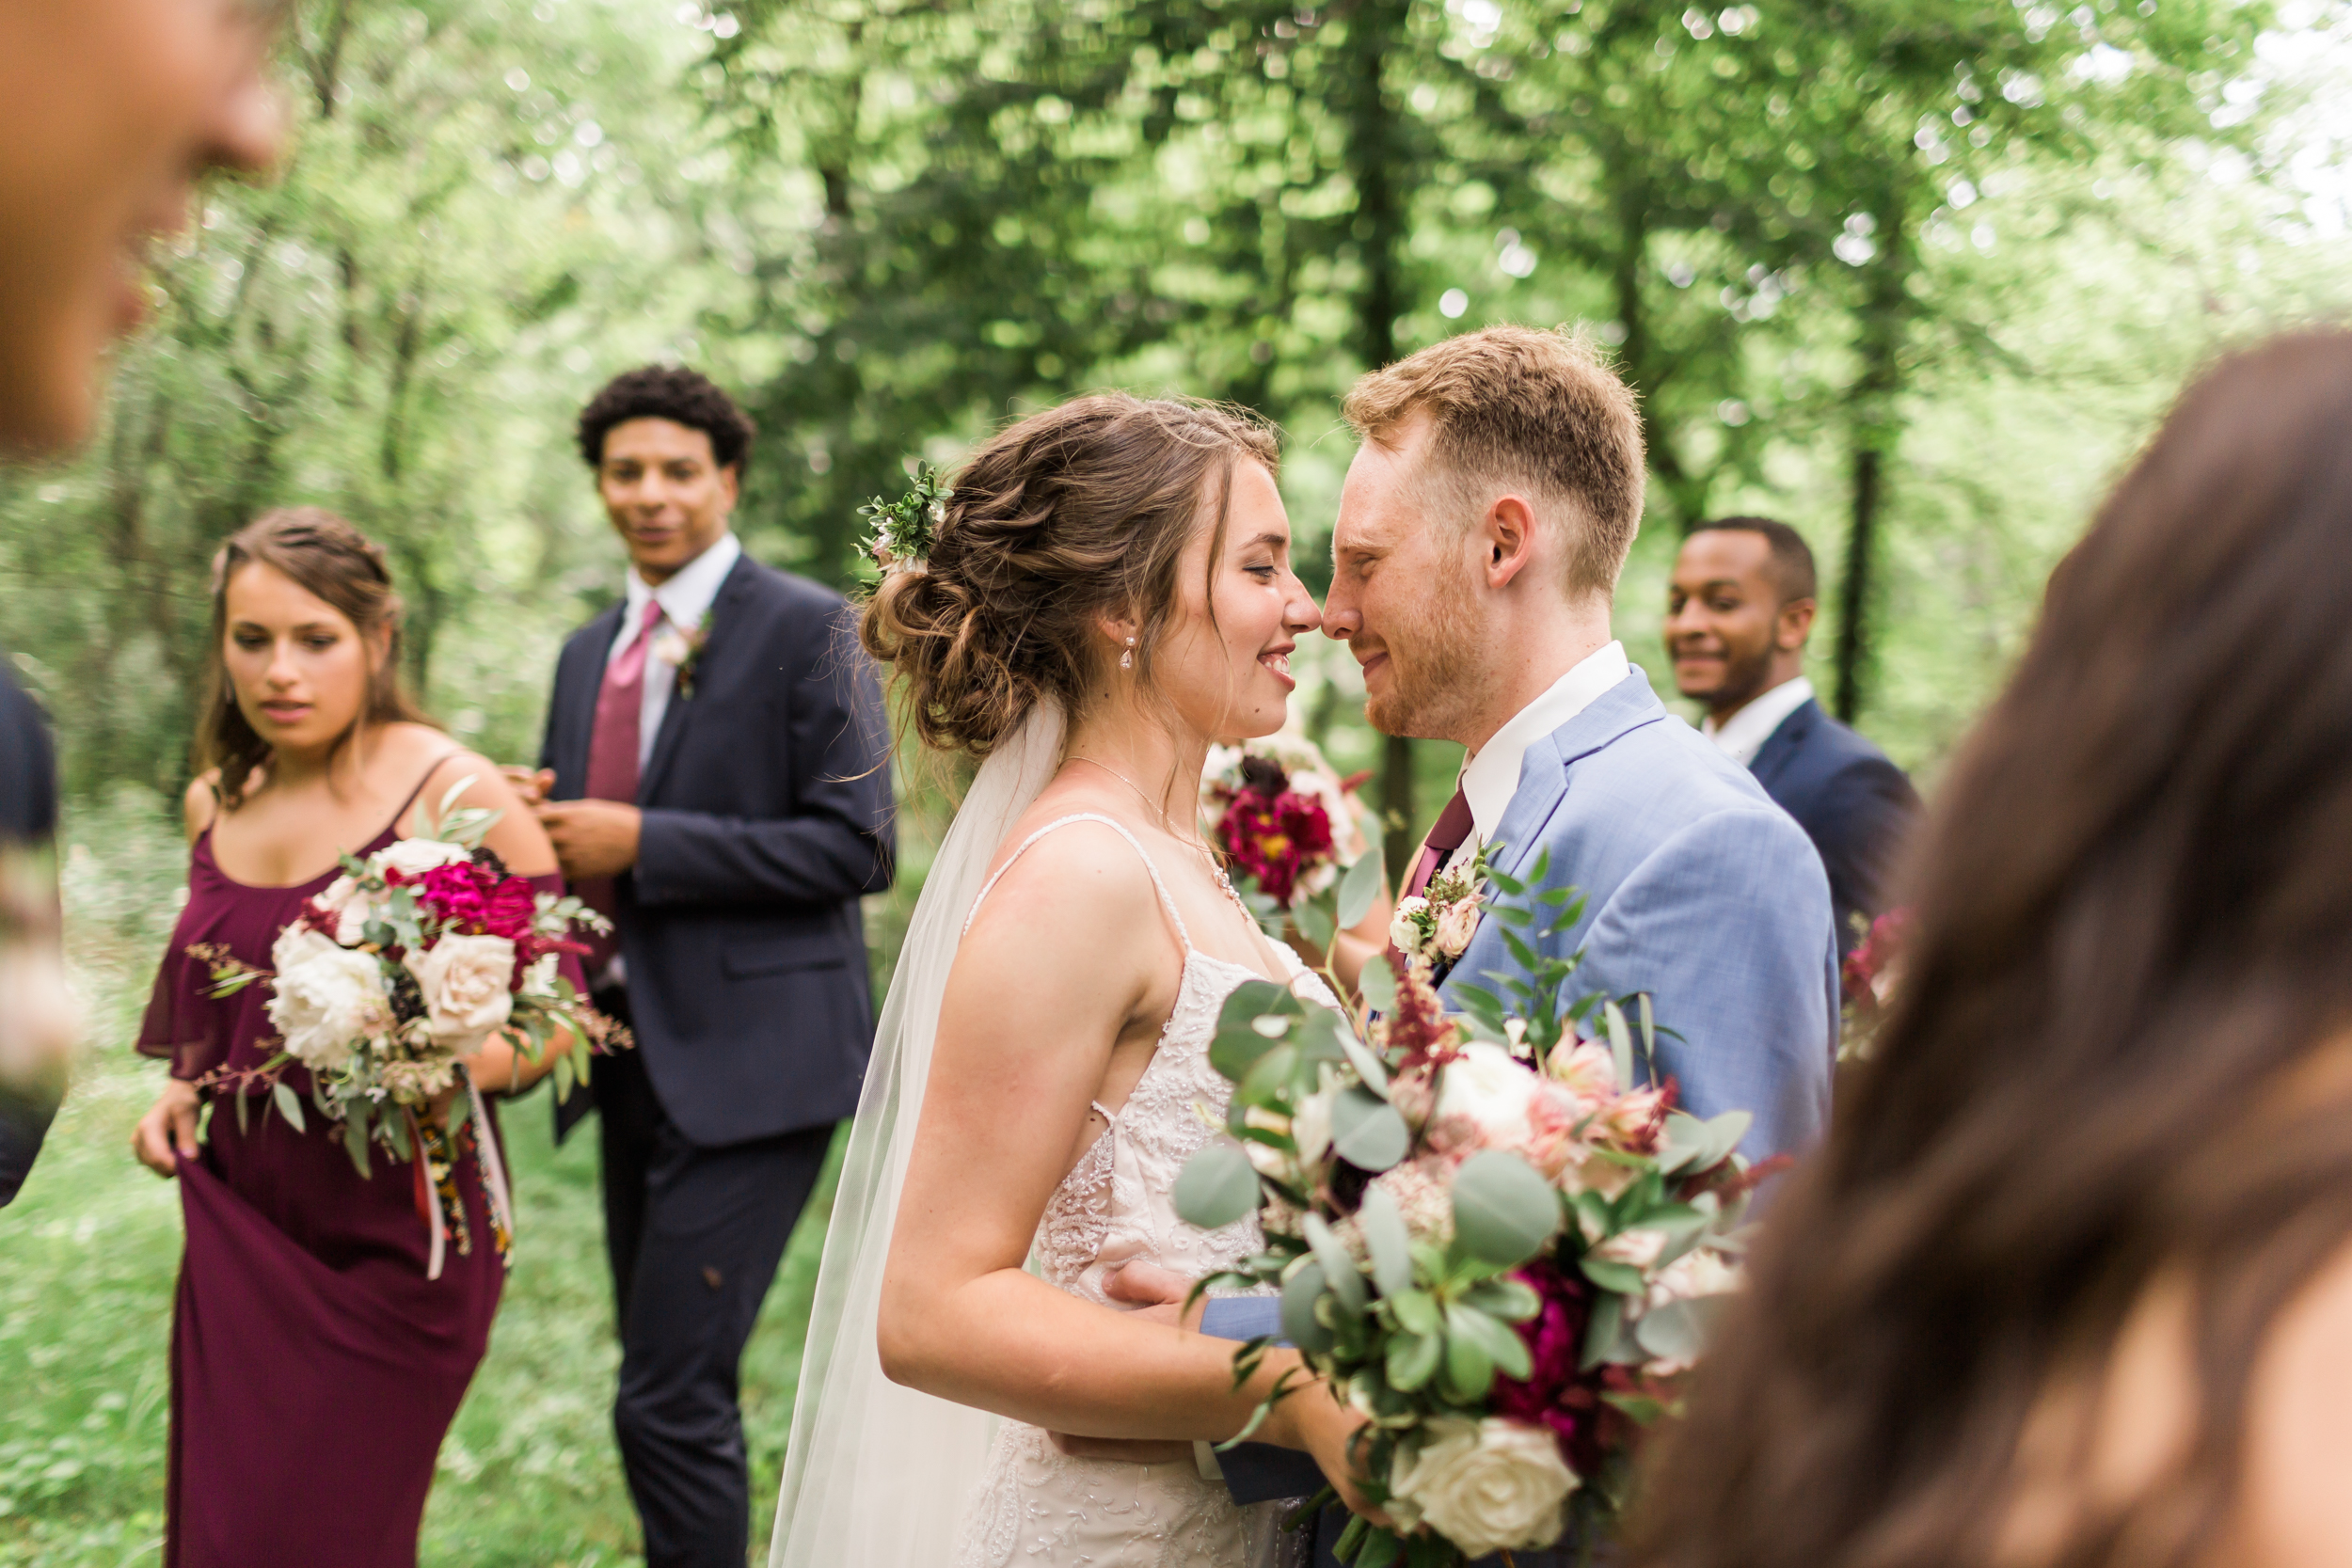 calebclairewedding-63.jpg